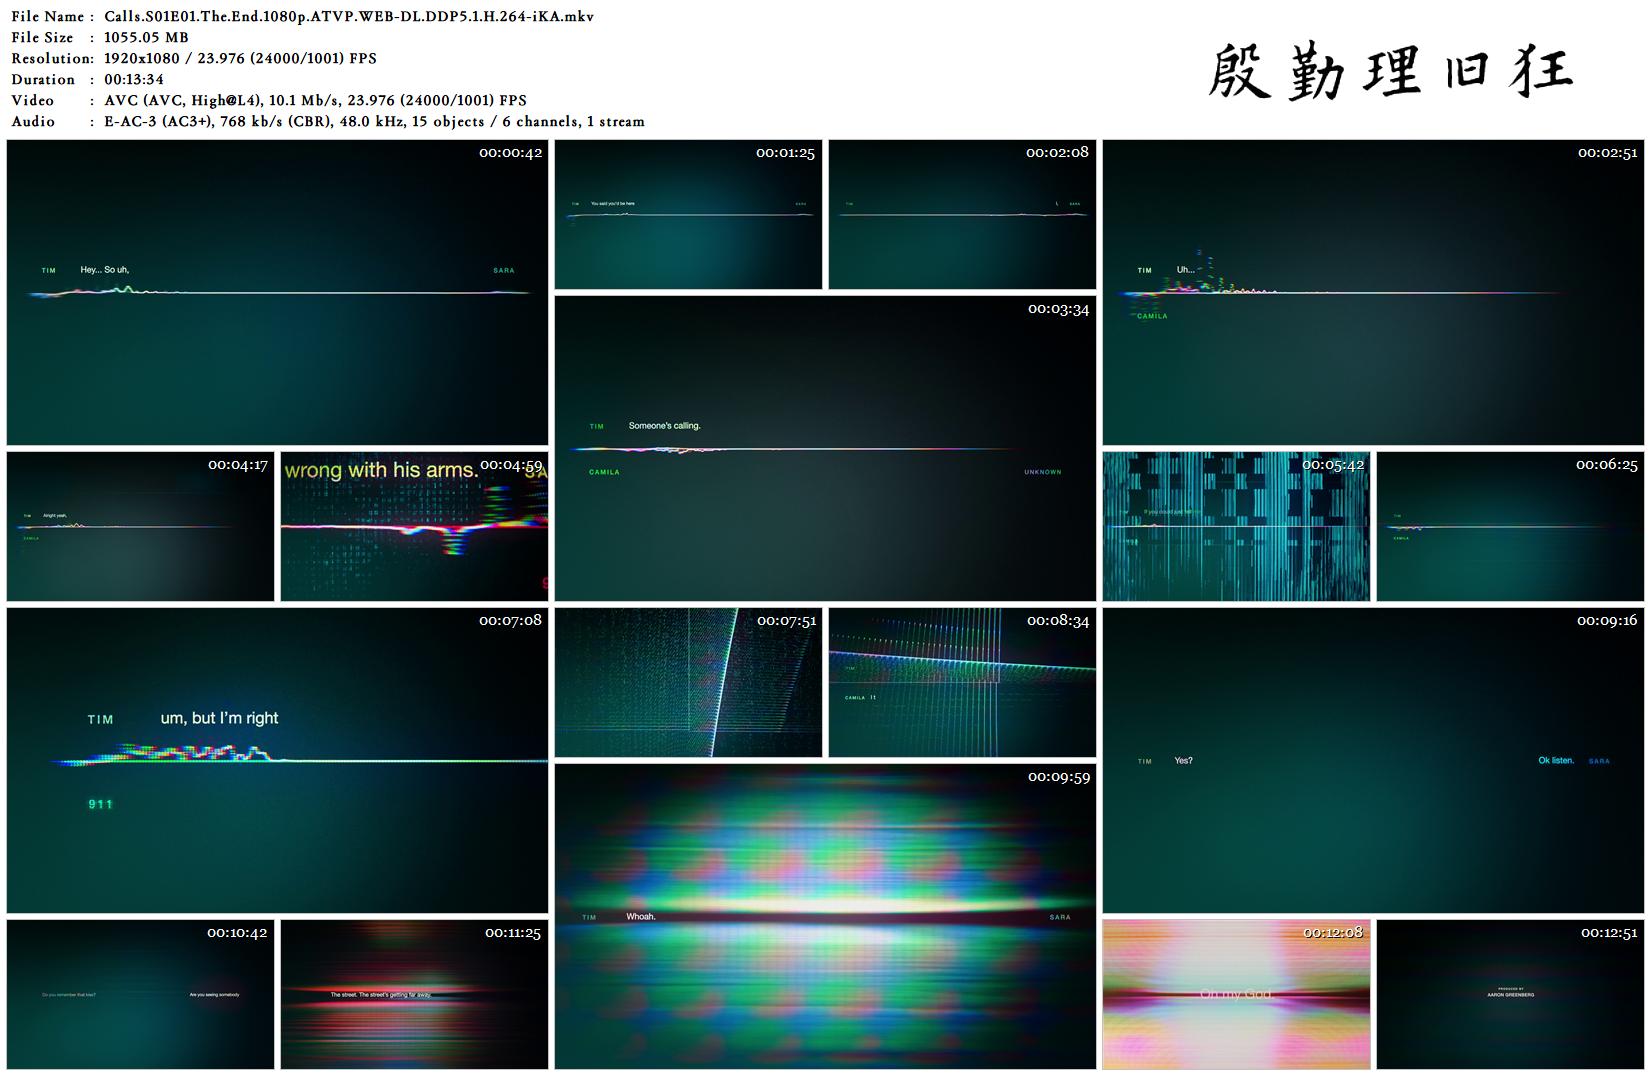 Calls.S01E01.The.End.1080p.ATVP.WEB-DL.DDP5.1.H.264-iKA.mkv.png